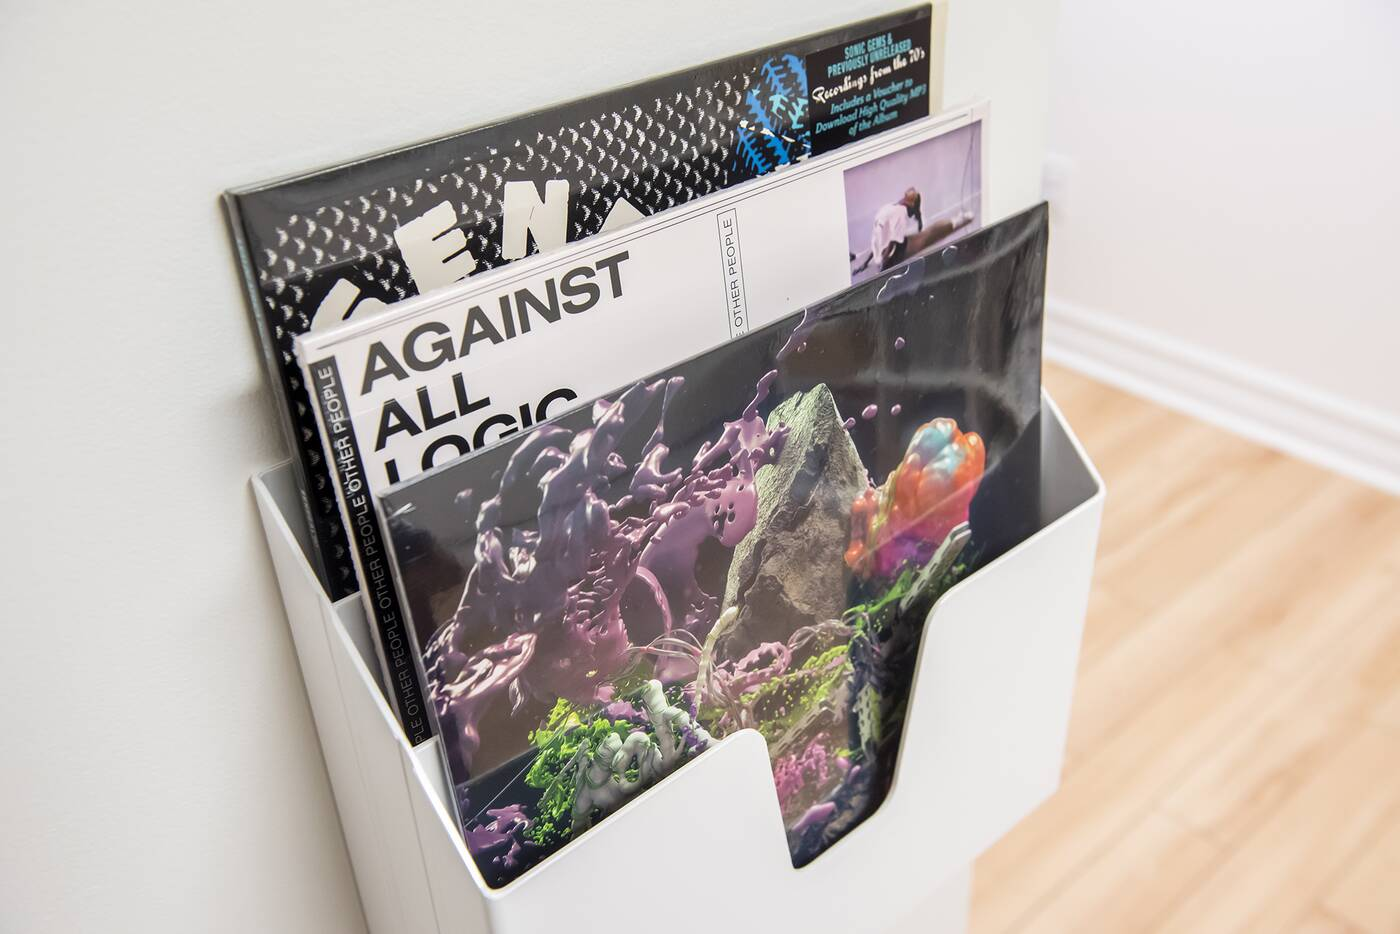 Big Shiny Records Toronto